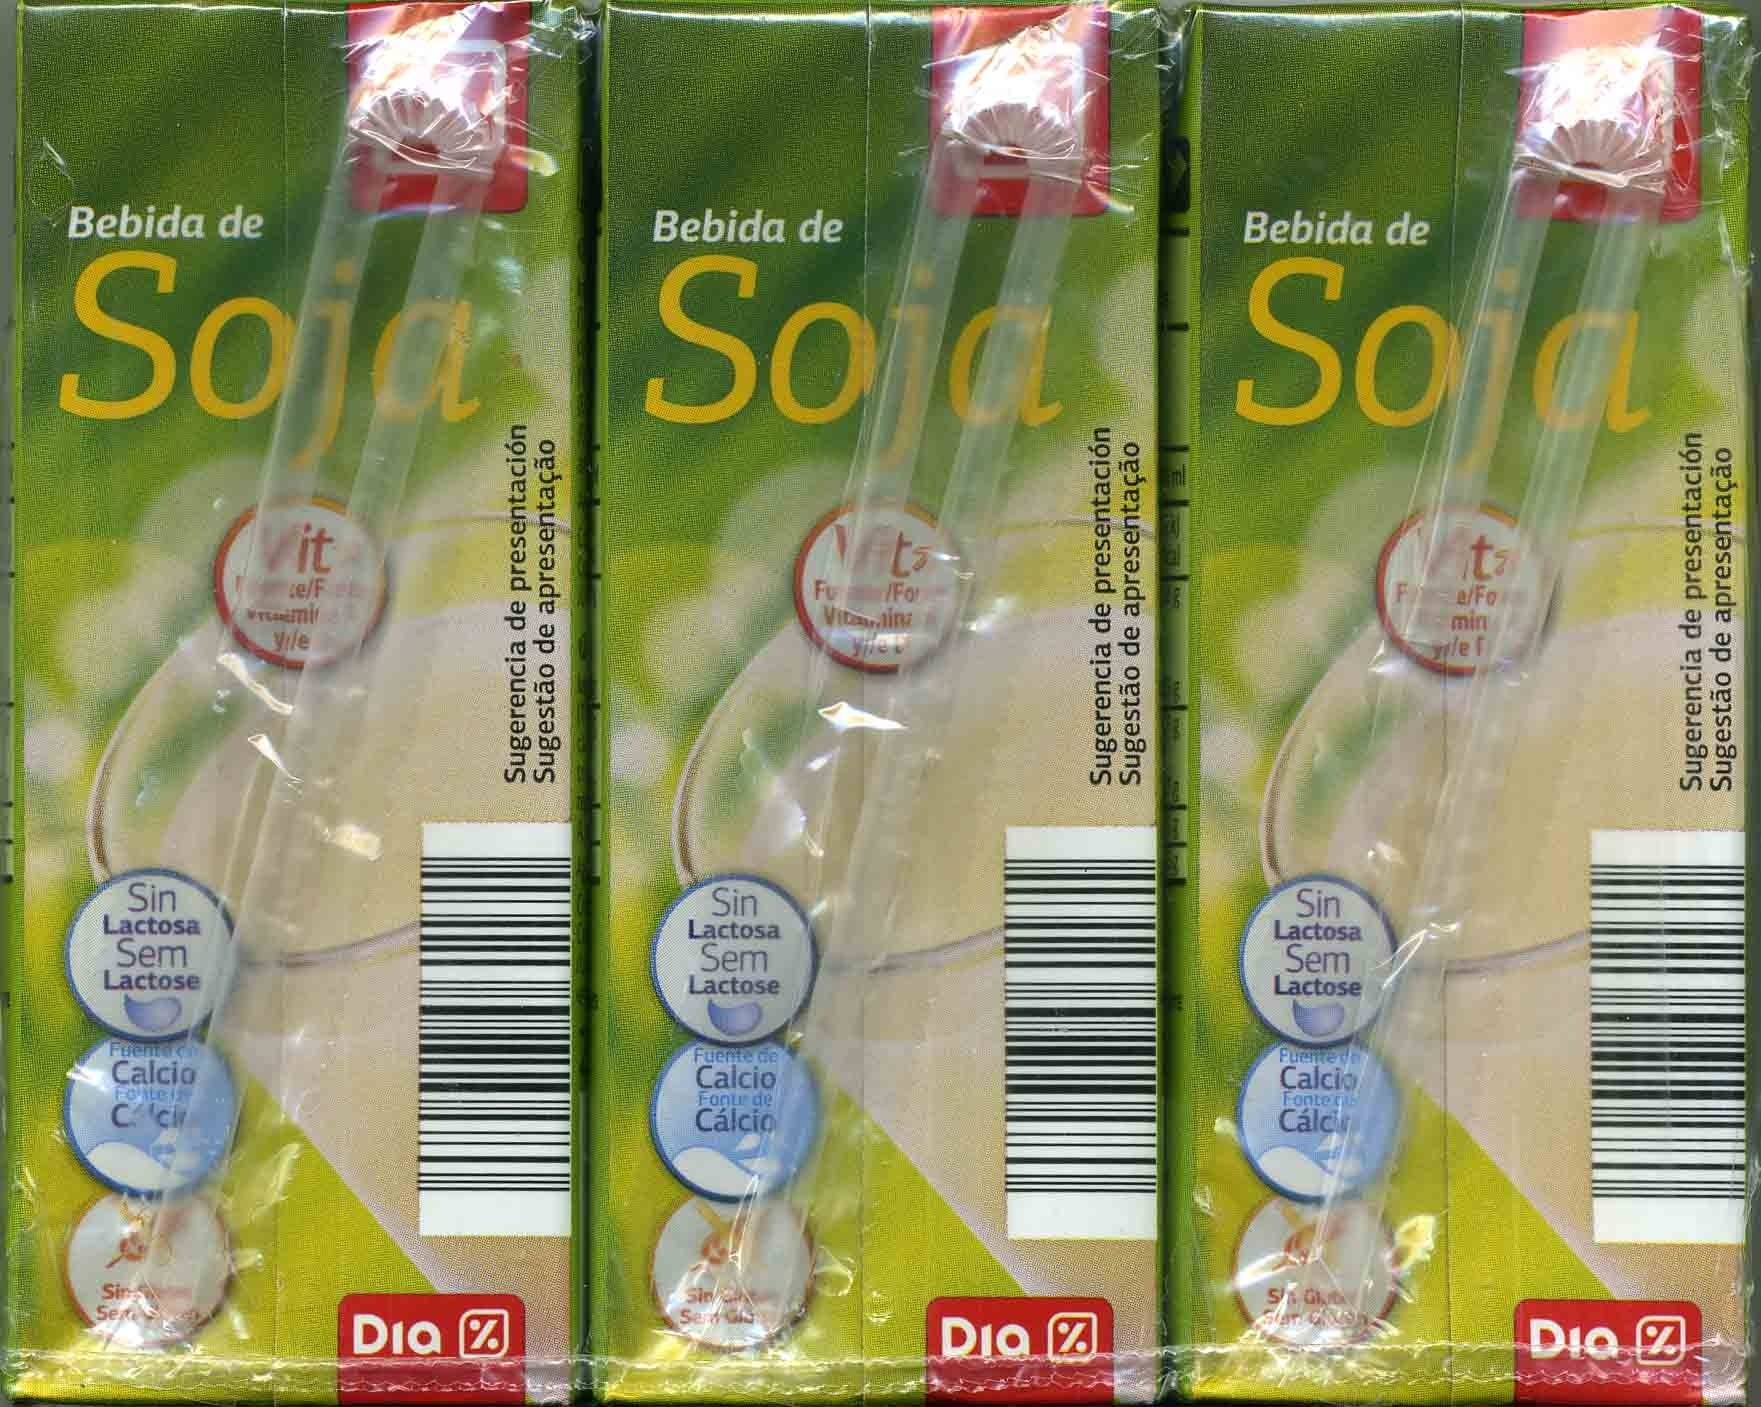 Bebida de soja - Pack de 3 - Producto